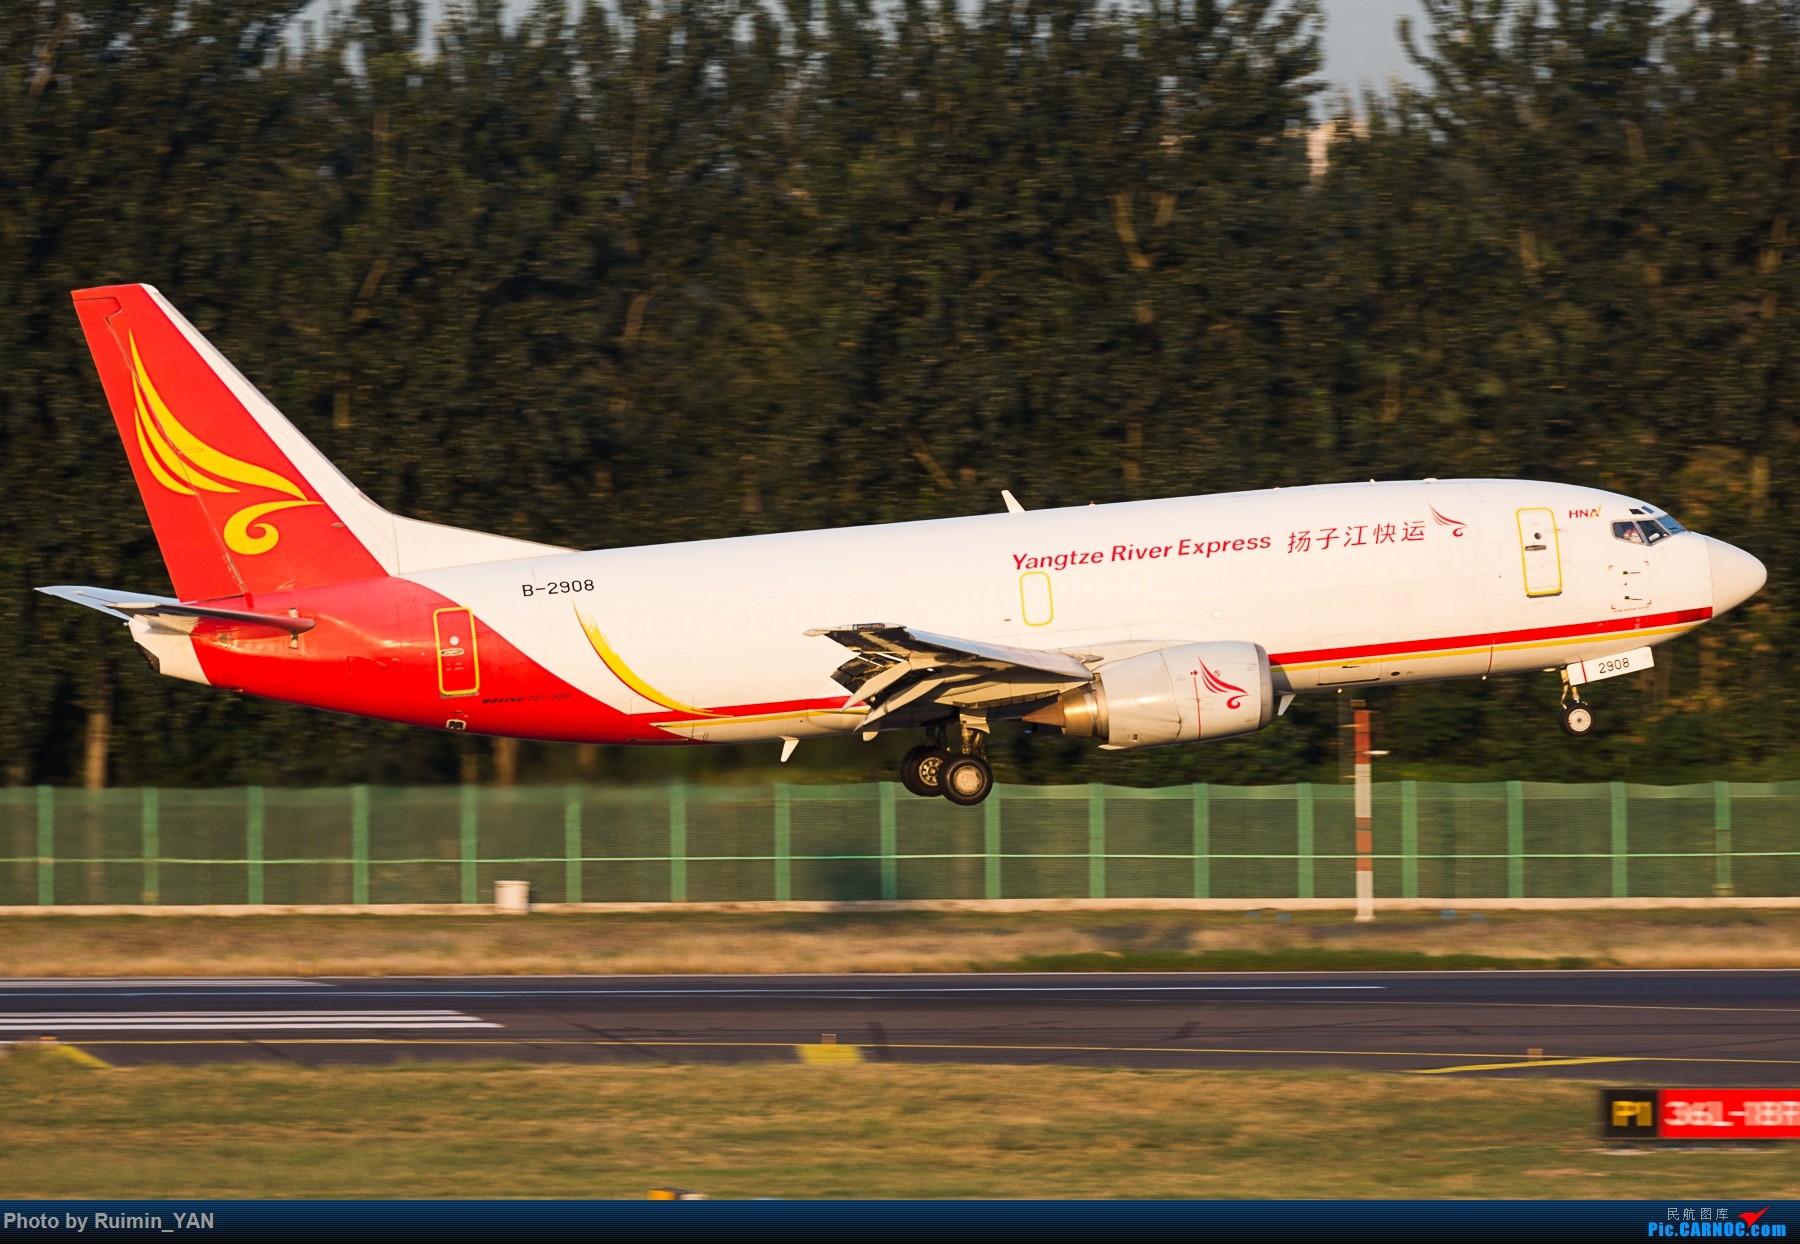 Re:[原创]【PEK】扬子江快运(Y8,Yangtze River Express) B-2908 733F BOEING 737-300 B-2908 中国北京首都国际机场